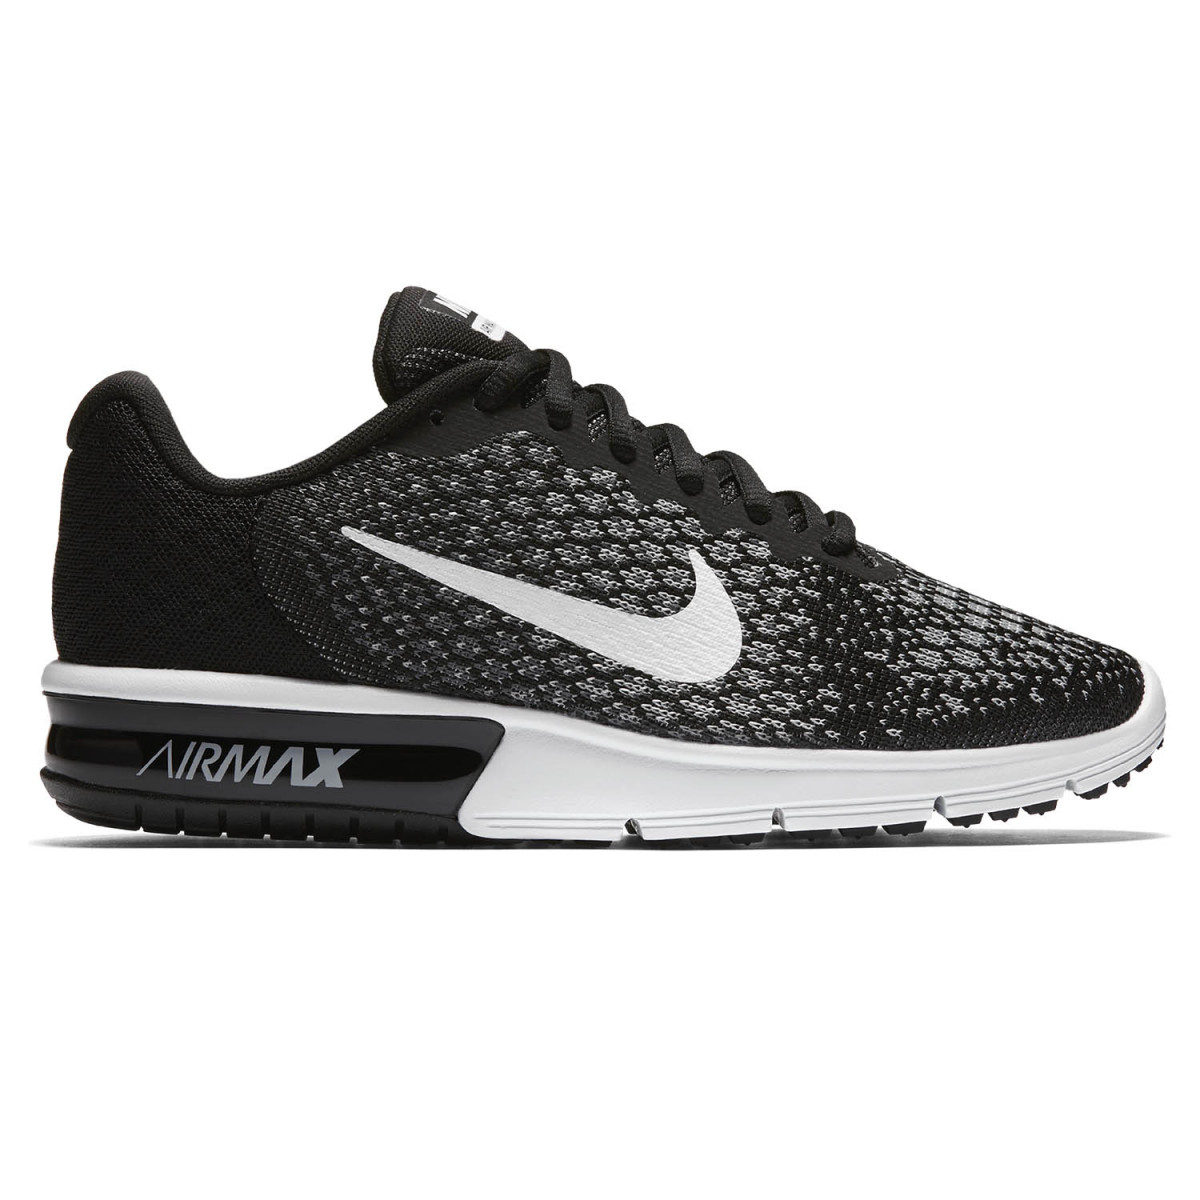 304fbc2f53062 Zapatillas Nike Air Max Sequent 2 - Running - Zapatillas - Mujer